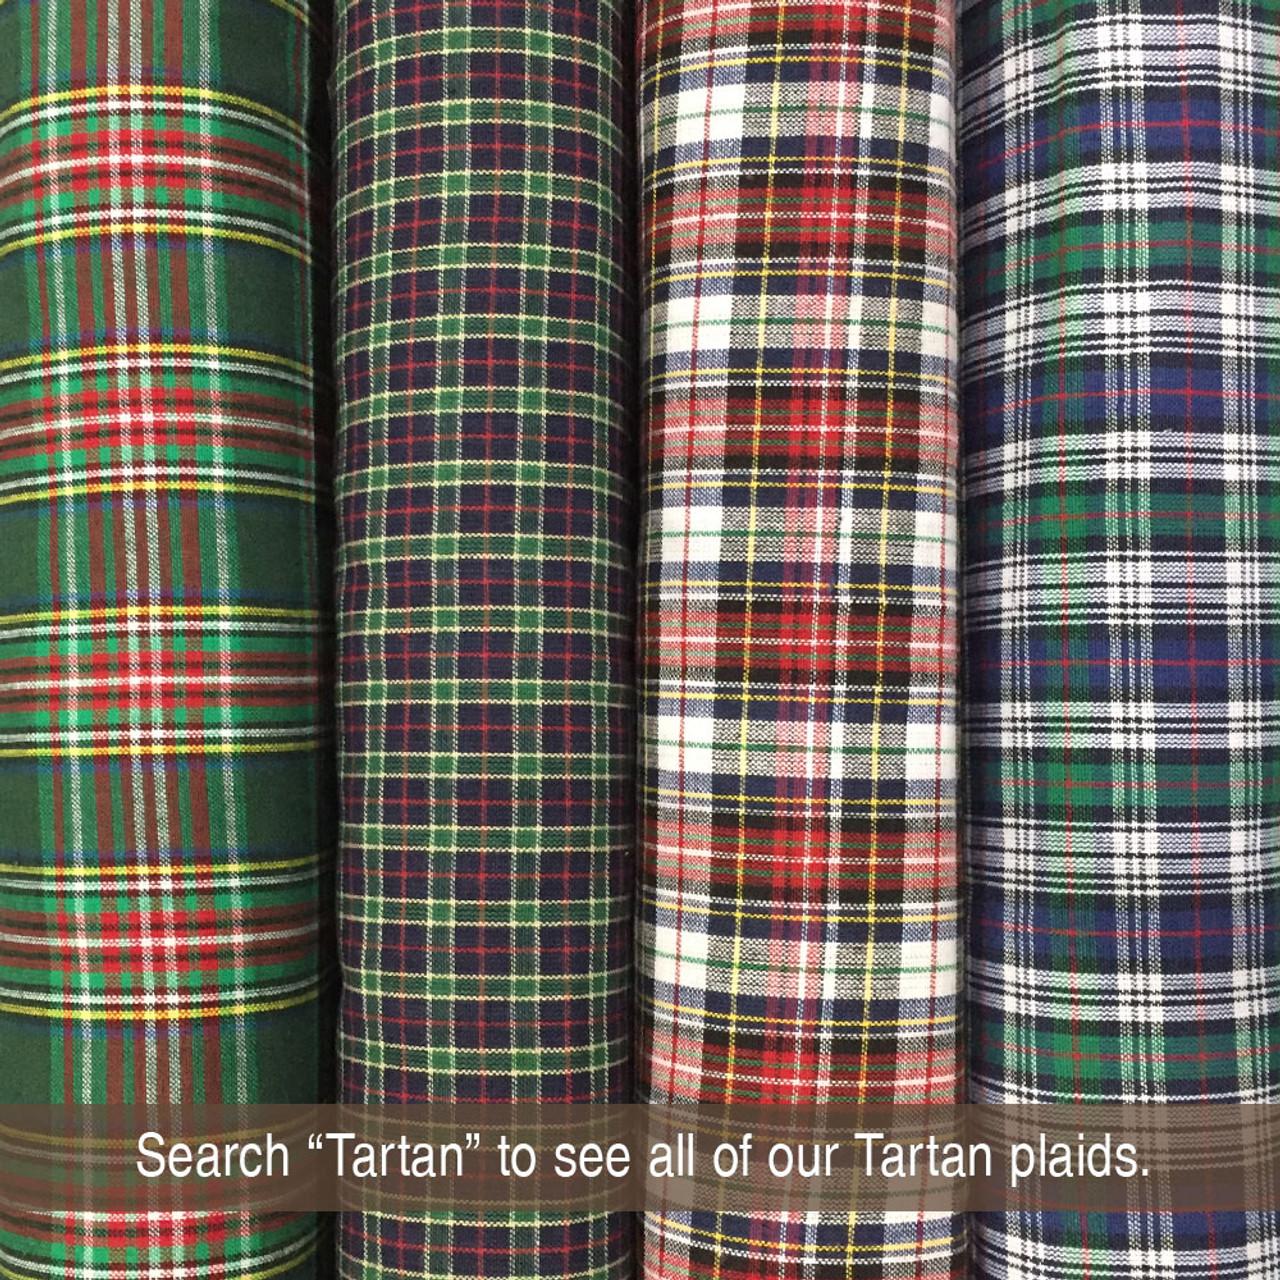 Red Plaid Fabric Red Royal Stewart Tartan Red and Green Plaid Homespun 100/% Cotton Fabric w61